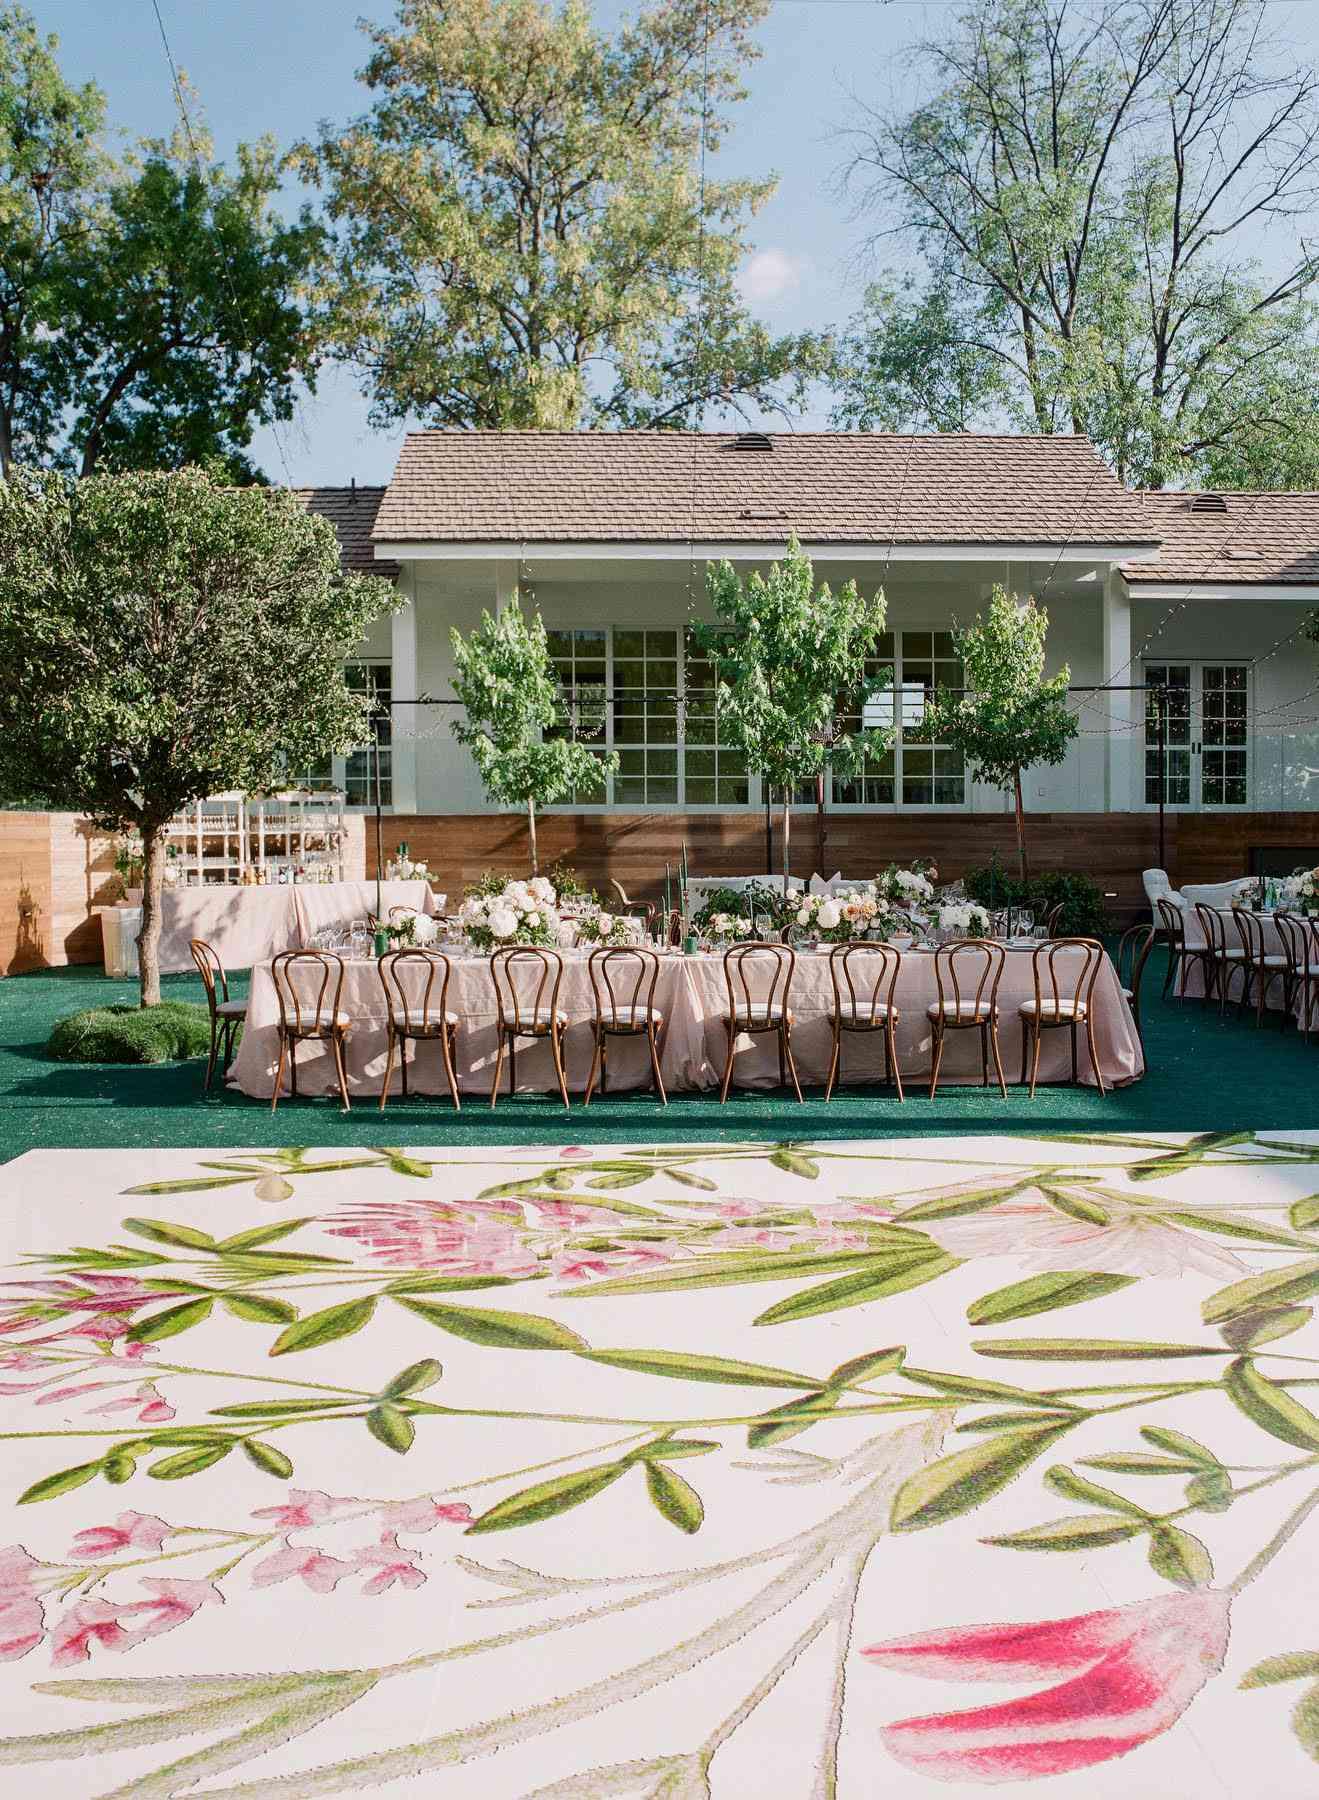 A dancefloor at an outdoor wedding with floral design